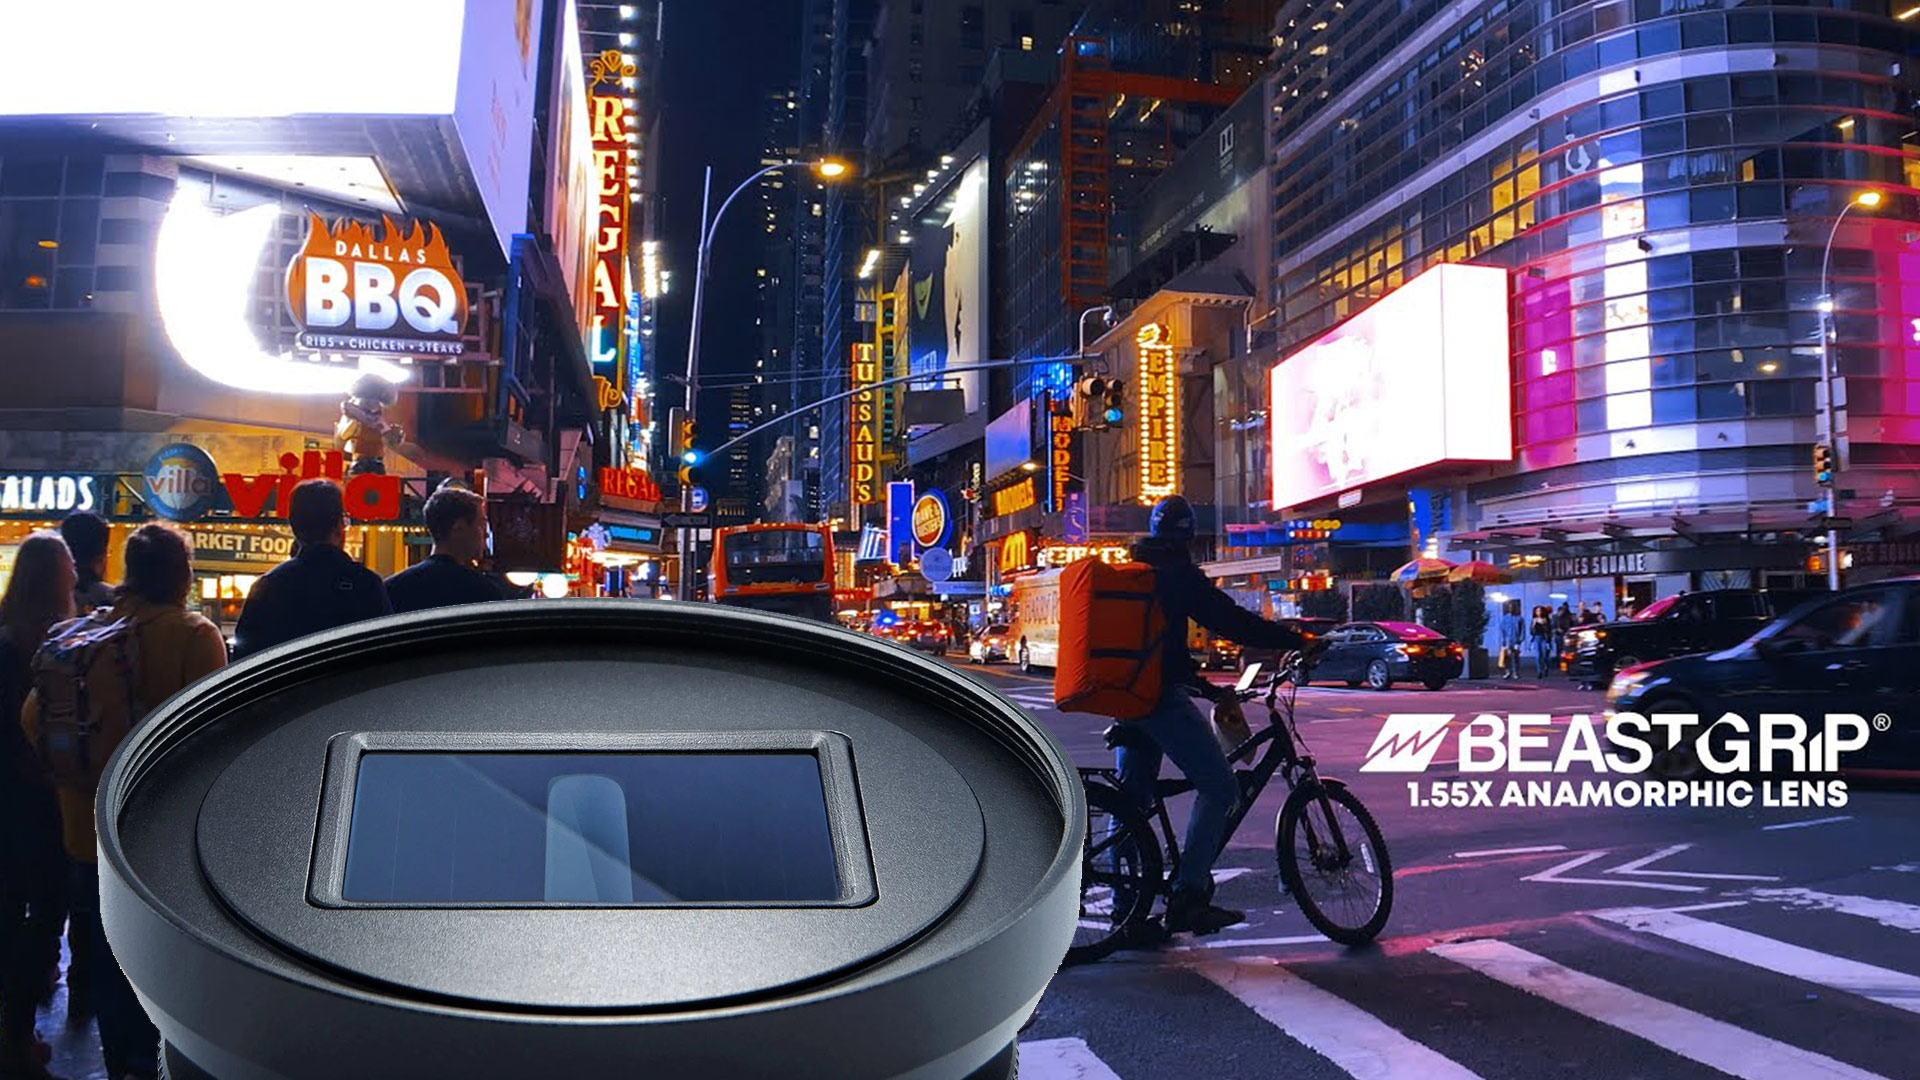 Lente anamórfico para teléfonos inteligentes Beastgrip 1.55X: próximamente en Kickstarter